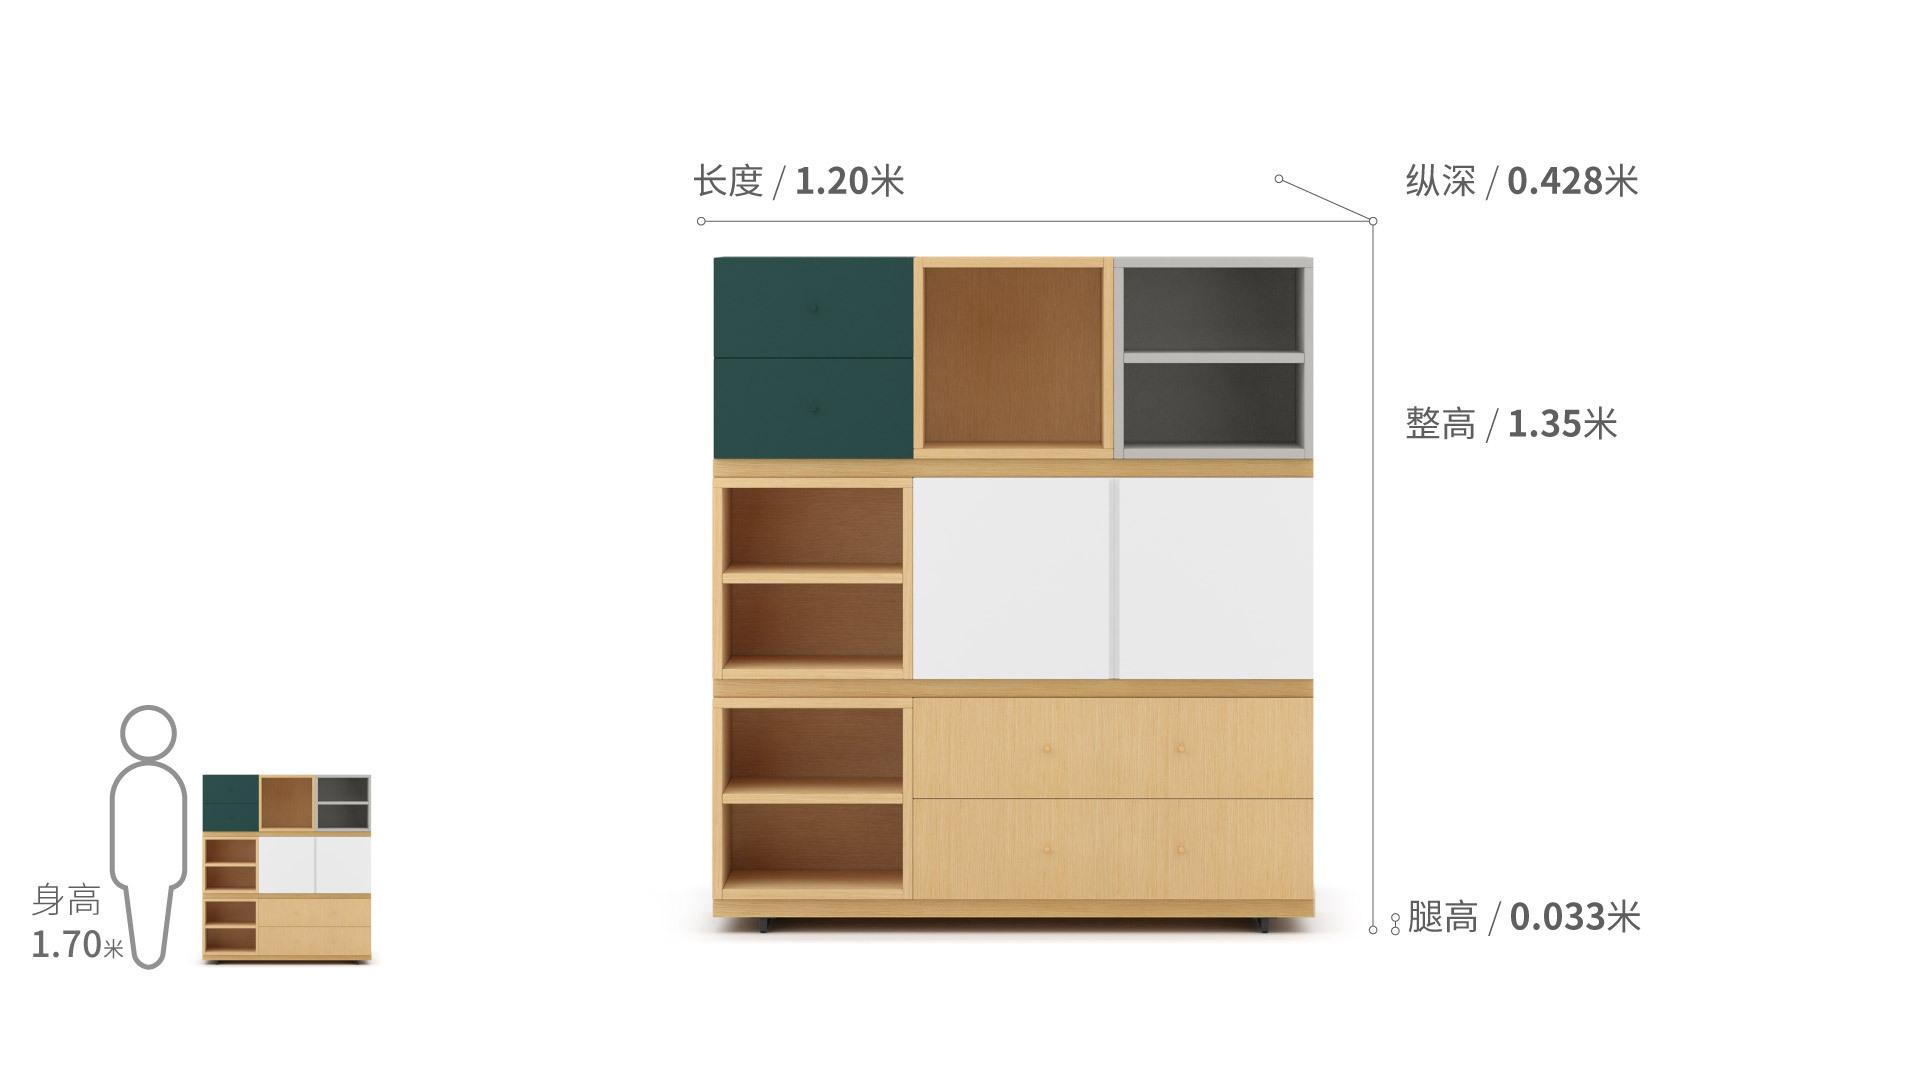 COSMO星格™置物柜1.35米高置物柜COSMO效果图